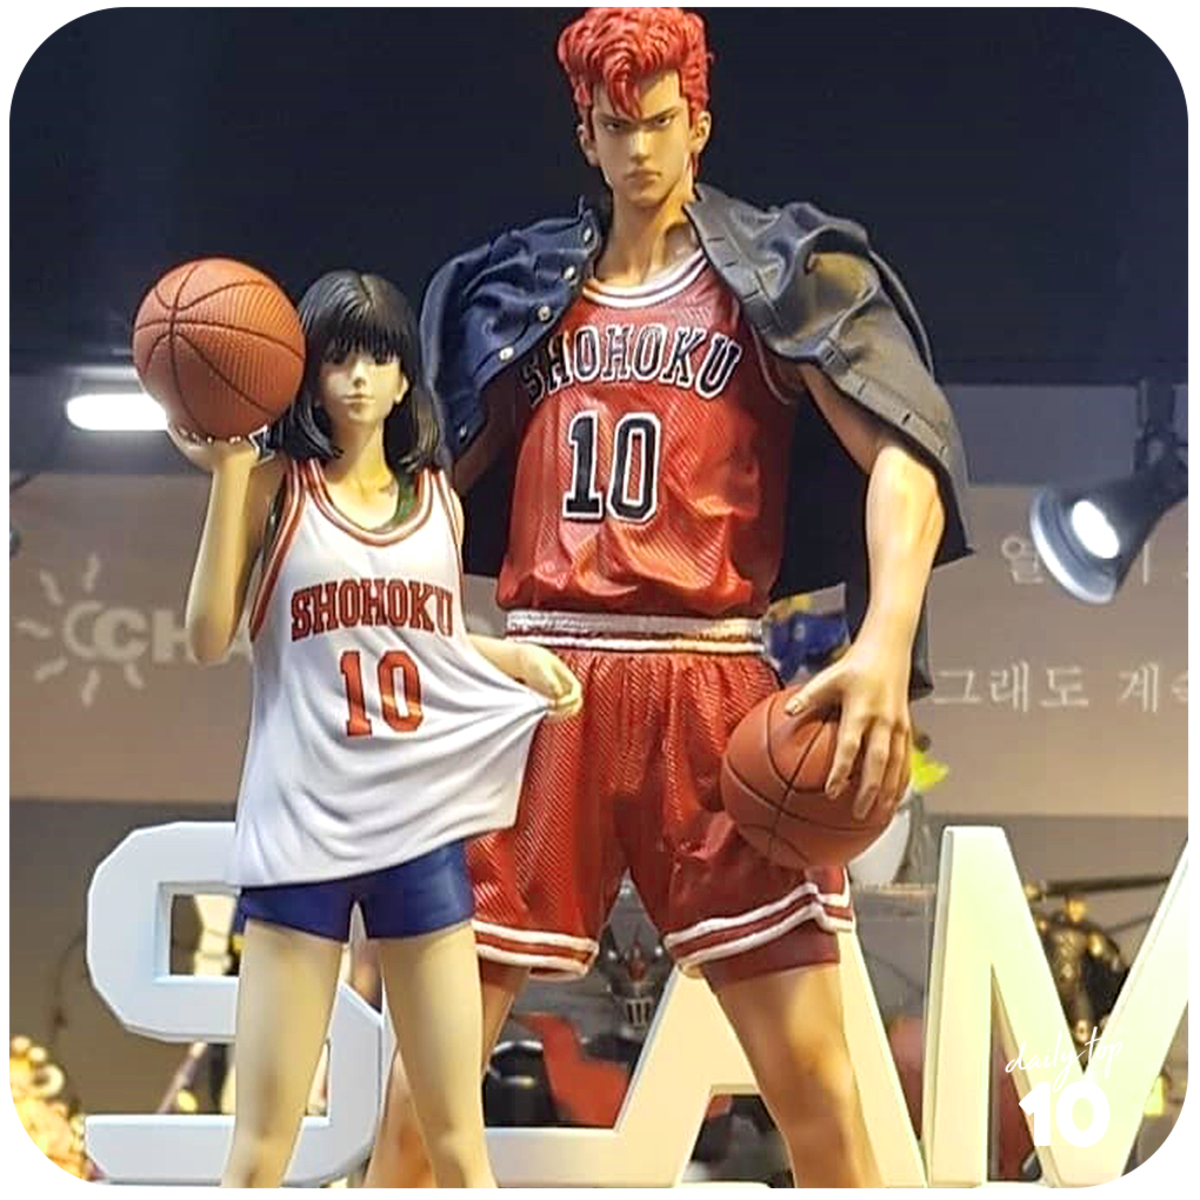 Sakuragi and Haruko action figures